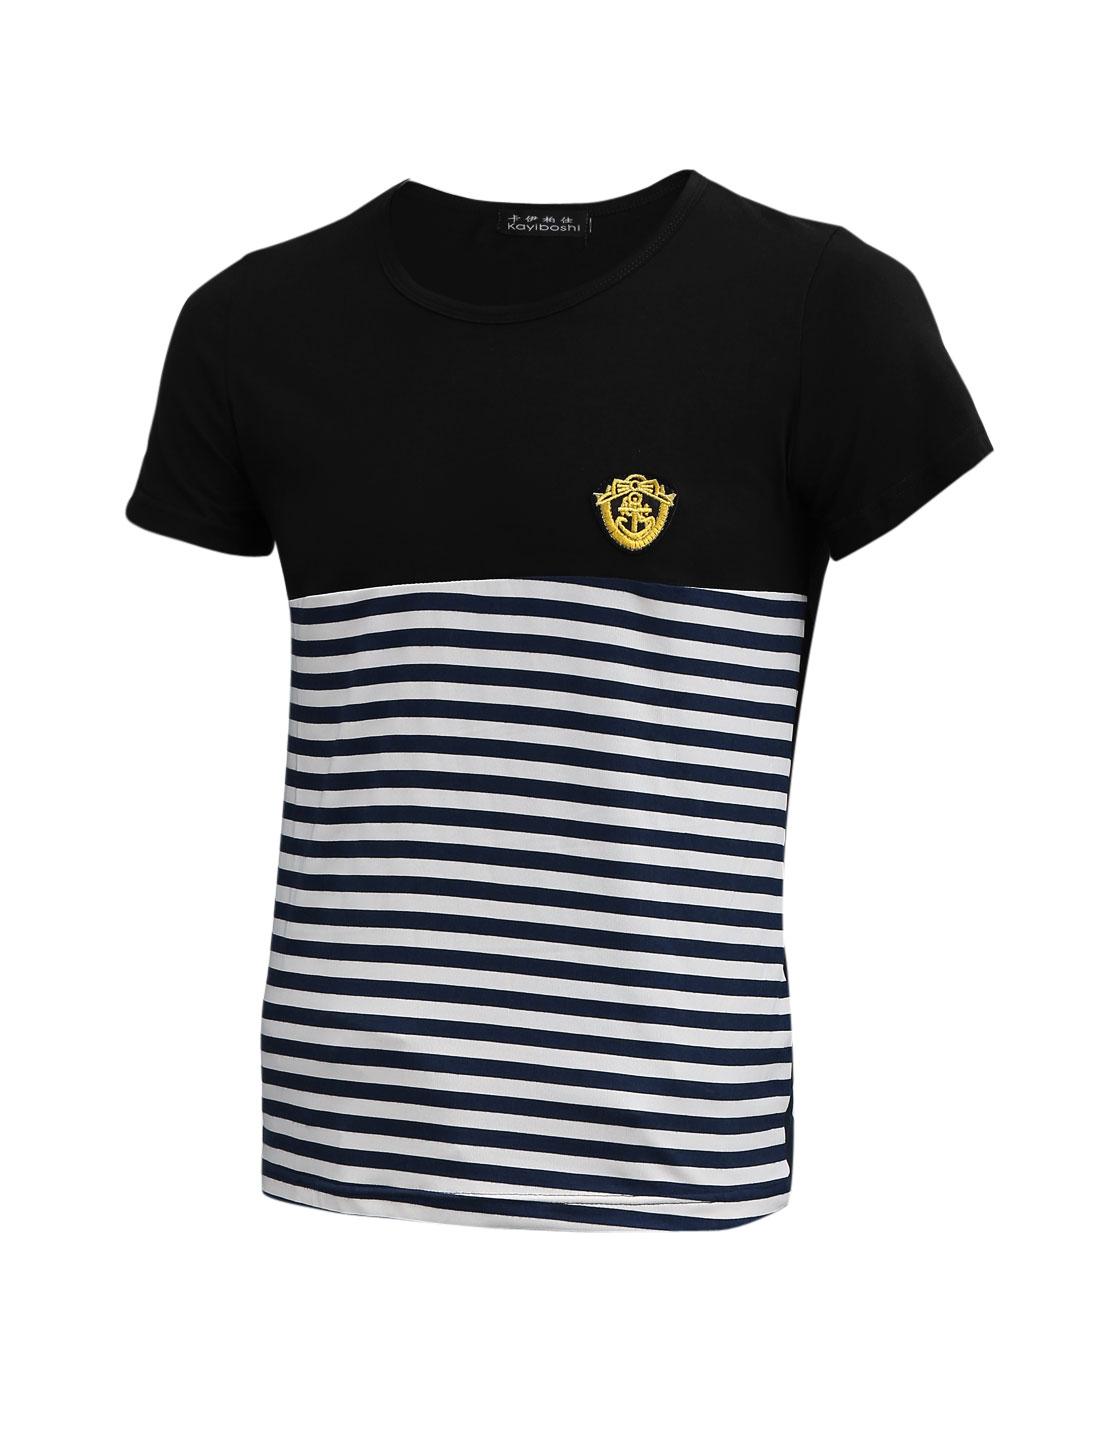 Men Horizontal Stripes Round Neck Embroidered Detail Basic T-Shirt Black S